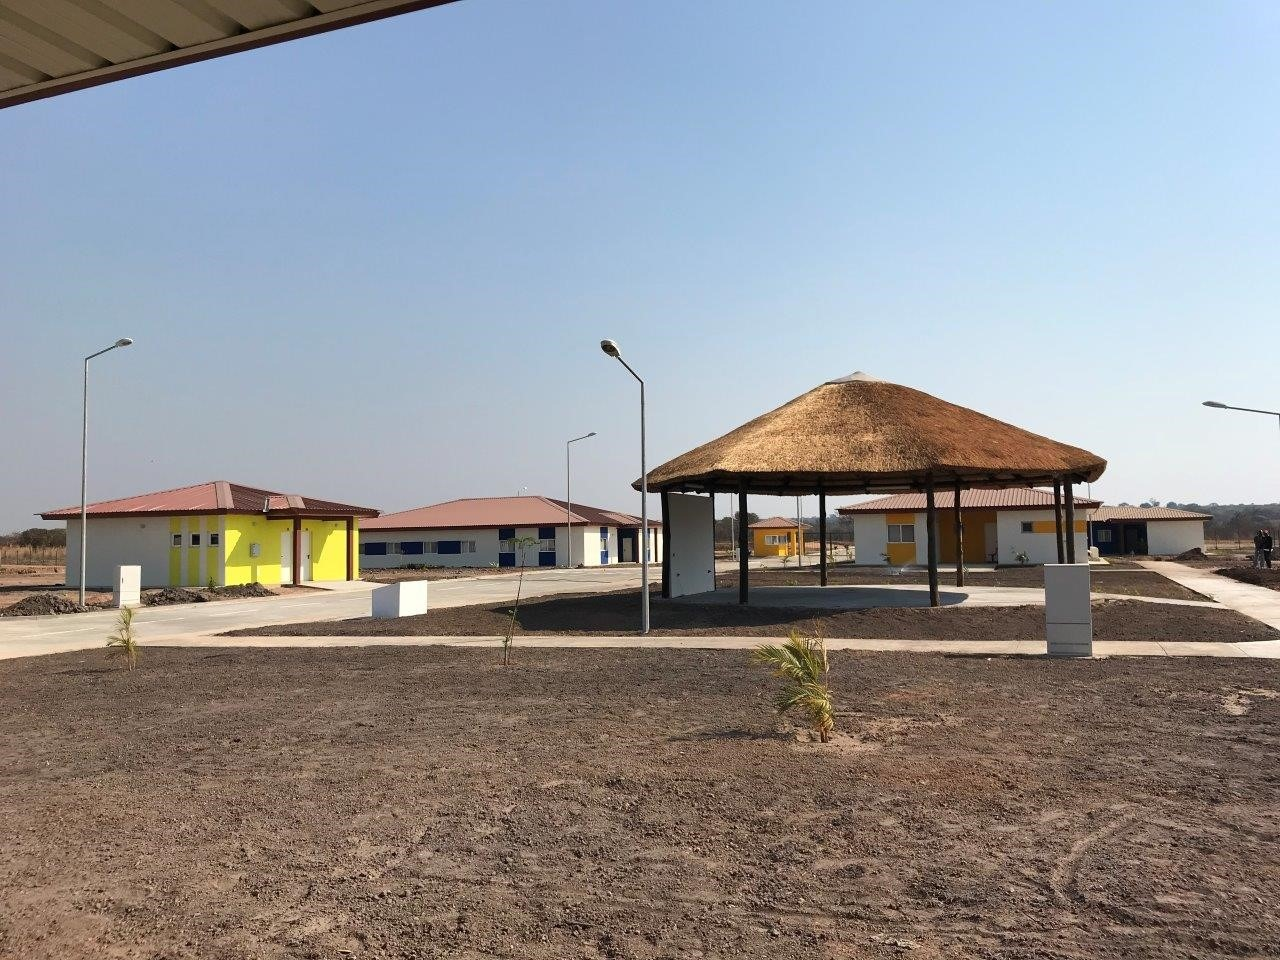 Cabinda Youth Village